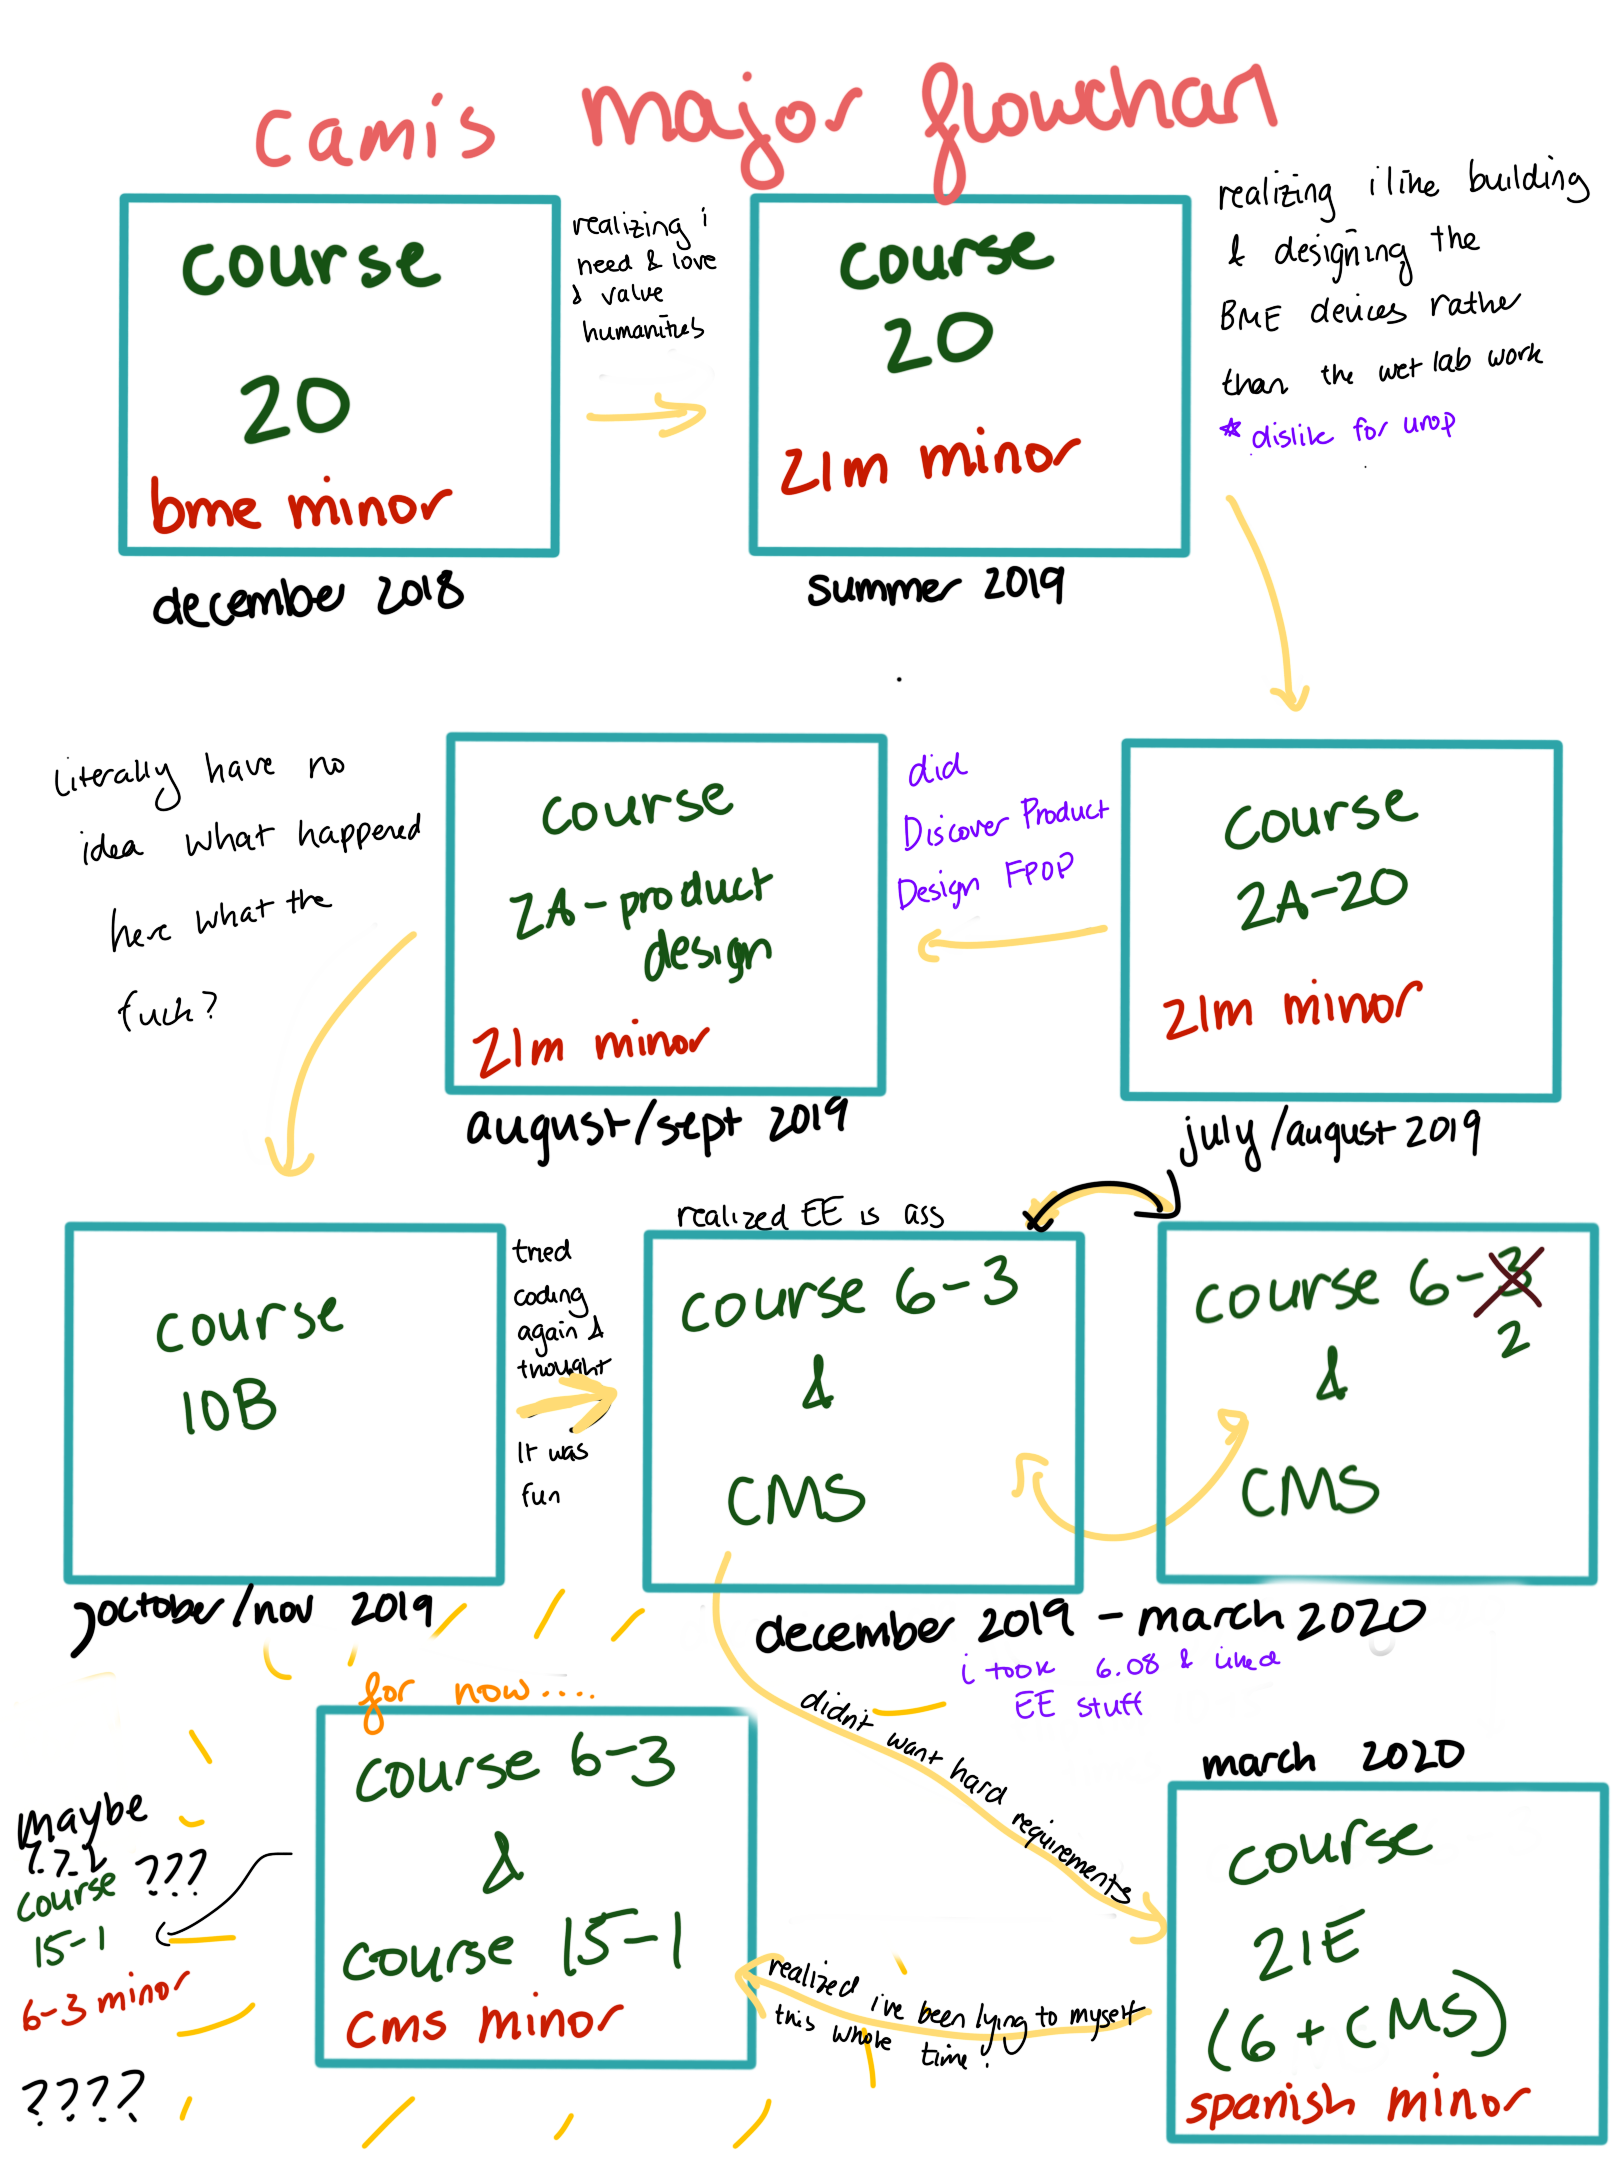 flow chart of my major